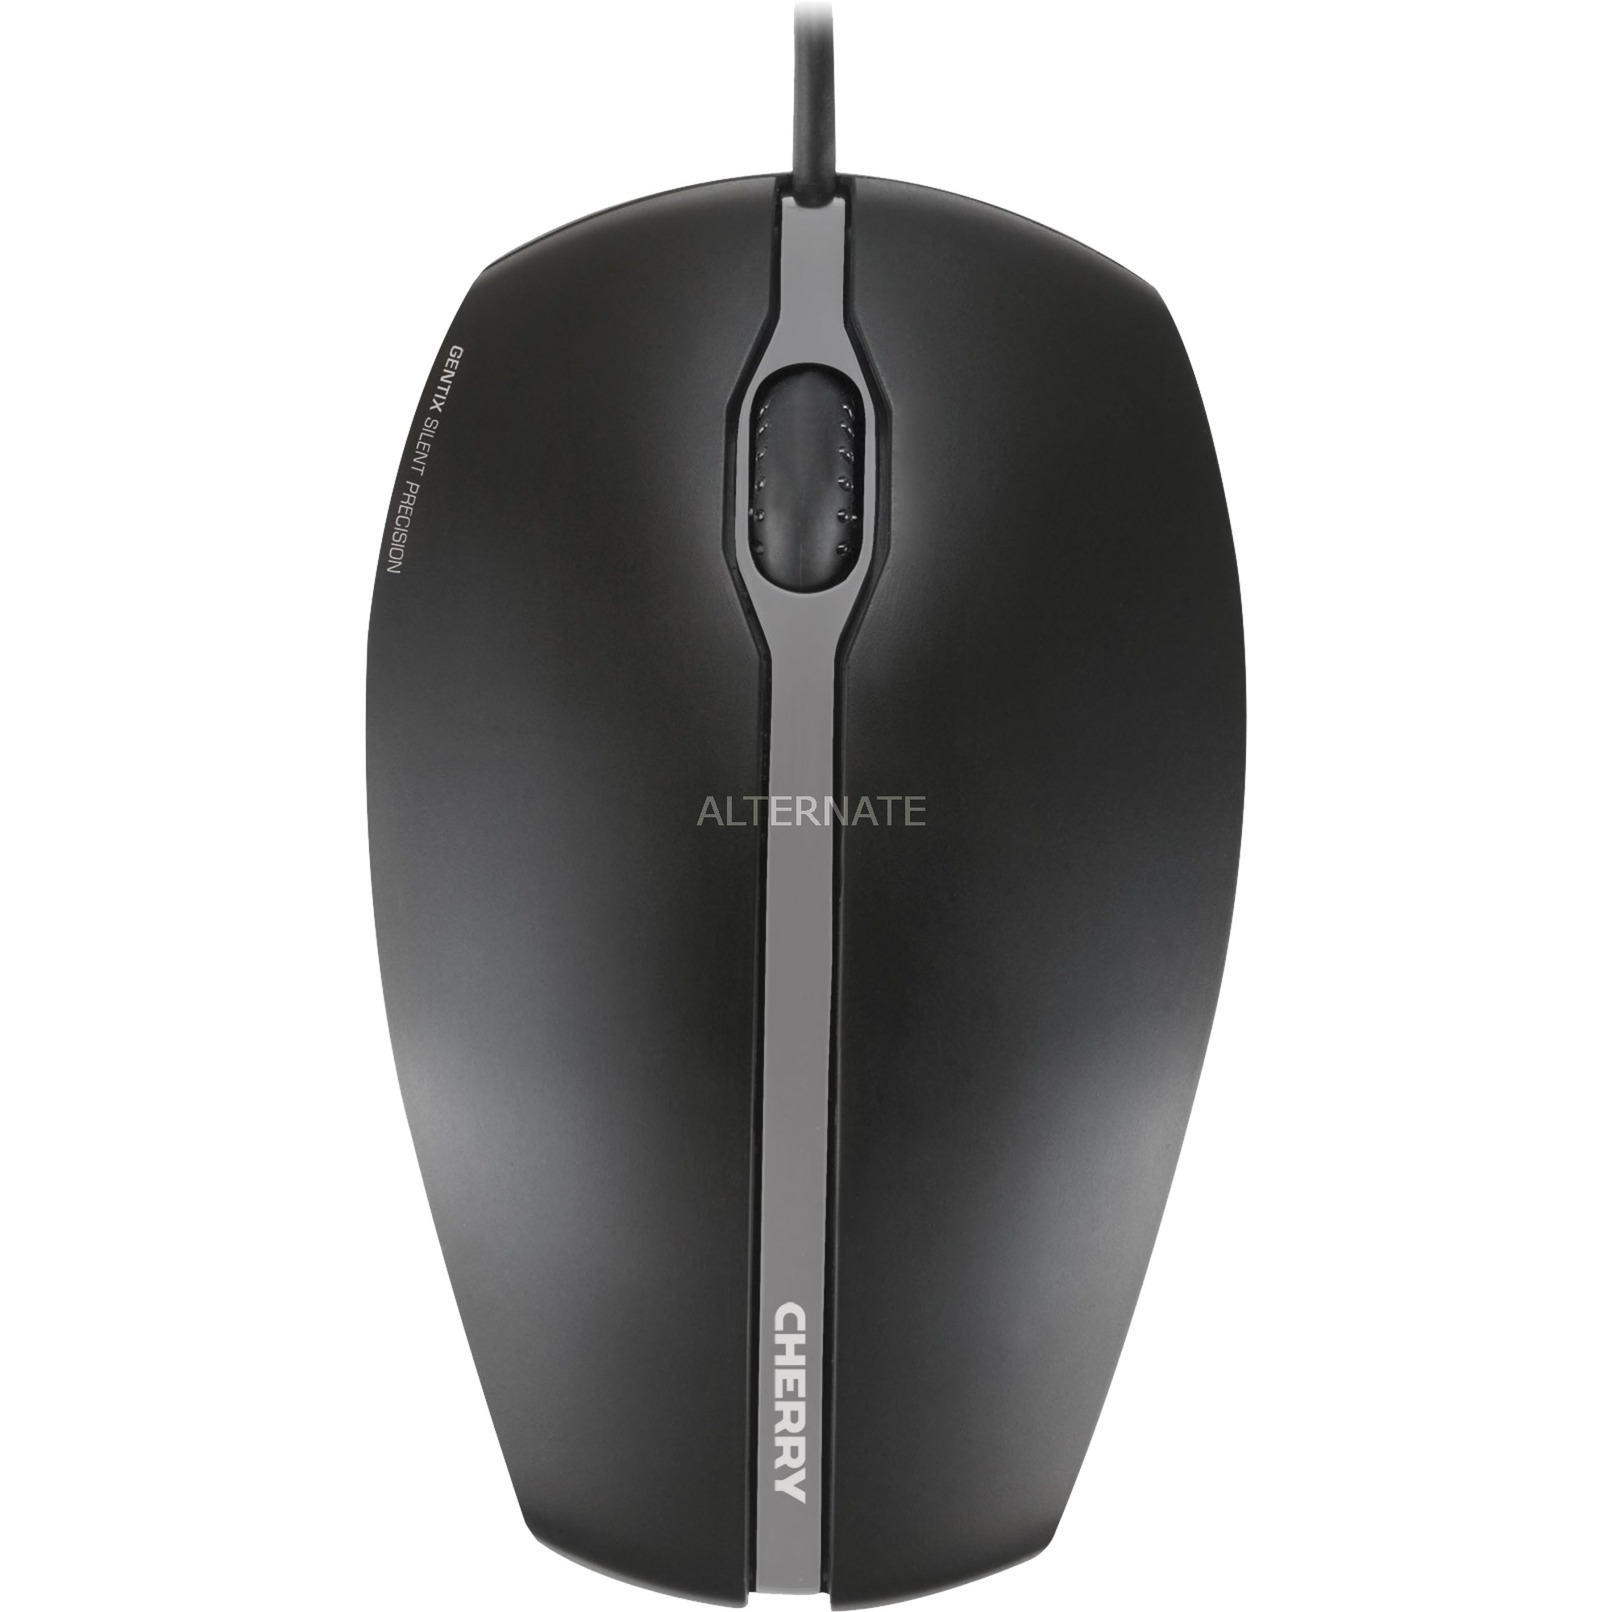 Gentix Silent ratón USB Óptico 1000 DPI Ambidextro